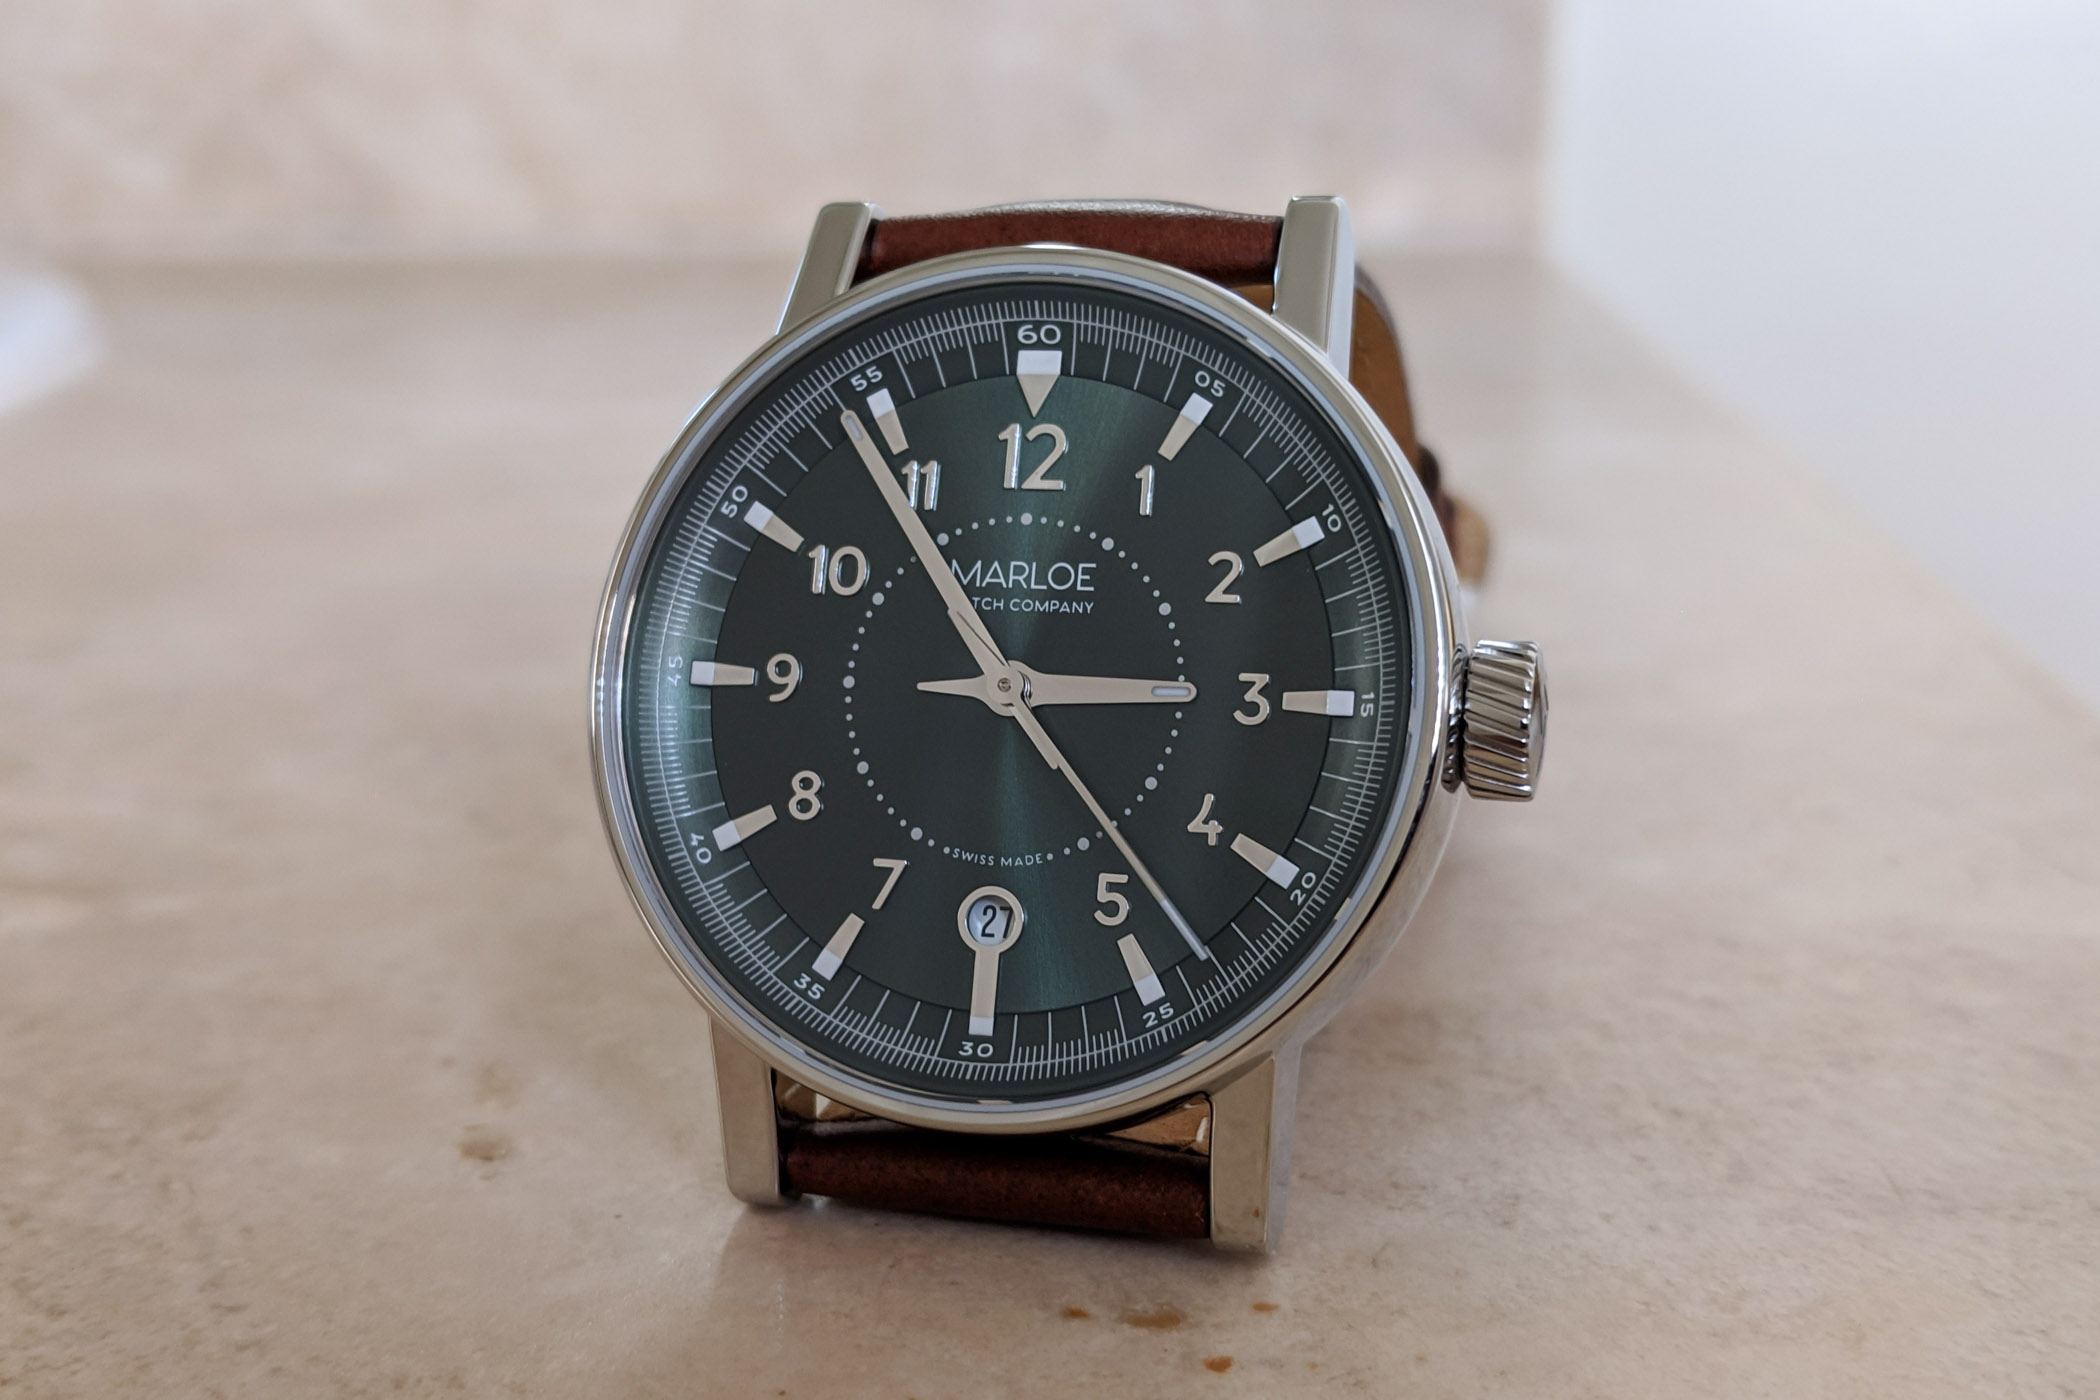 Marloe Watch Company Haskell hand-wound ETA